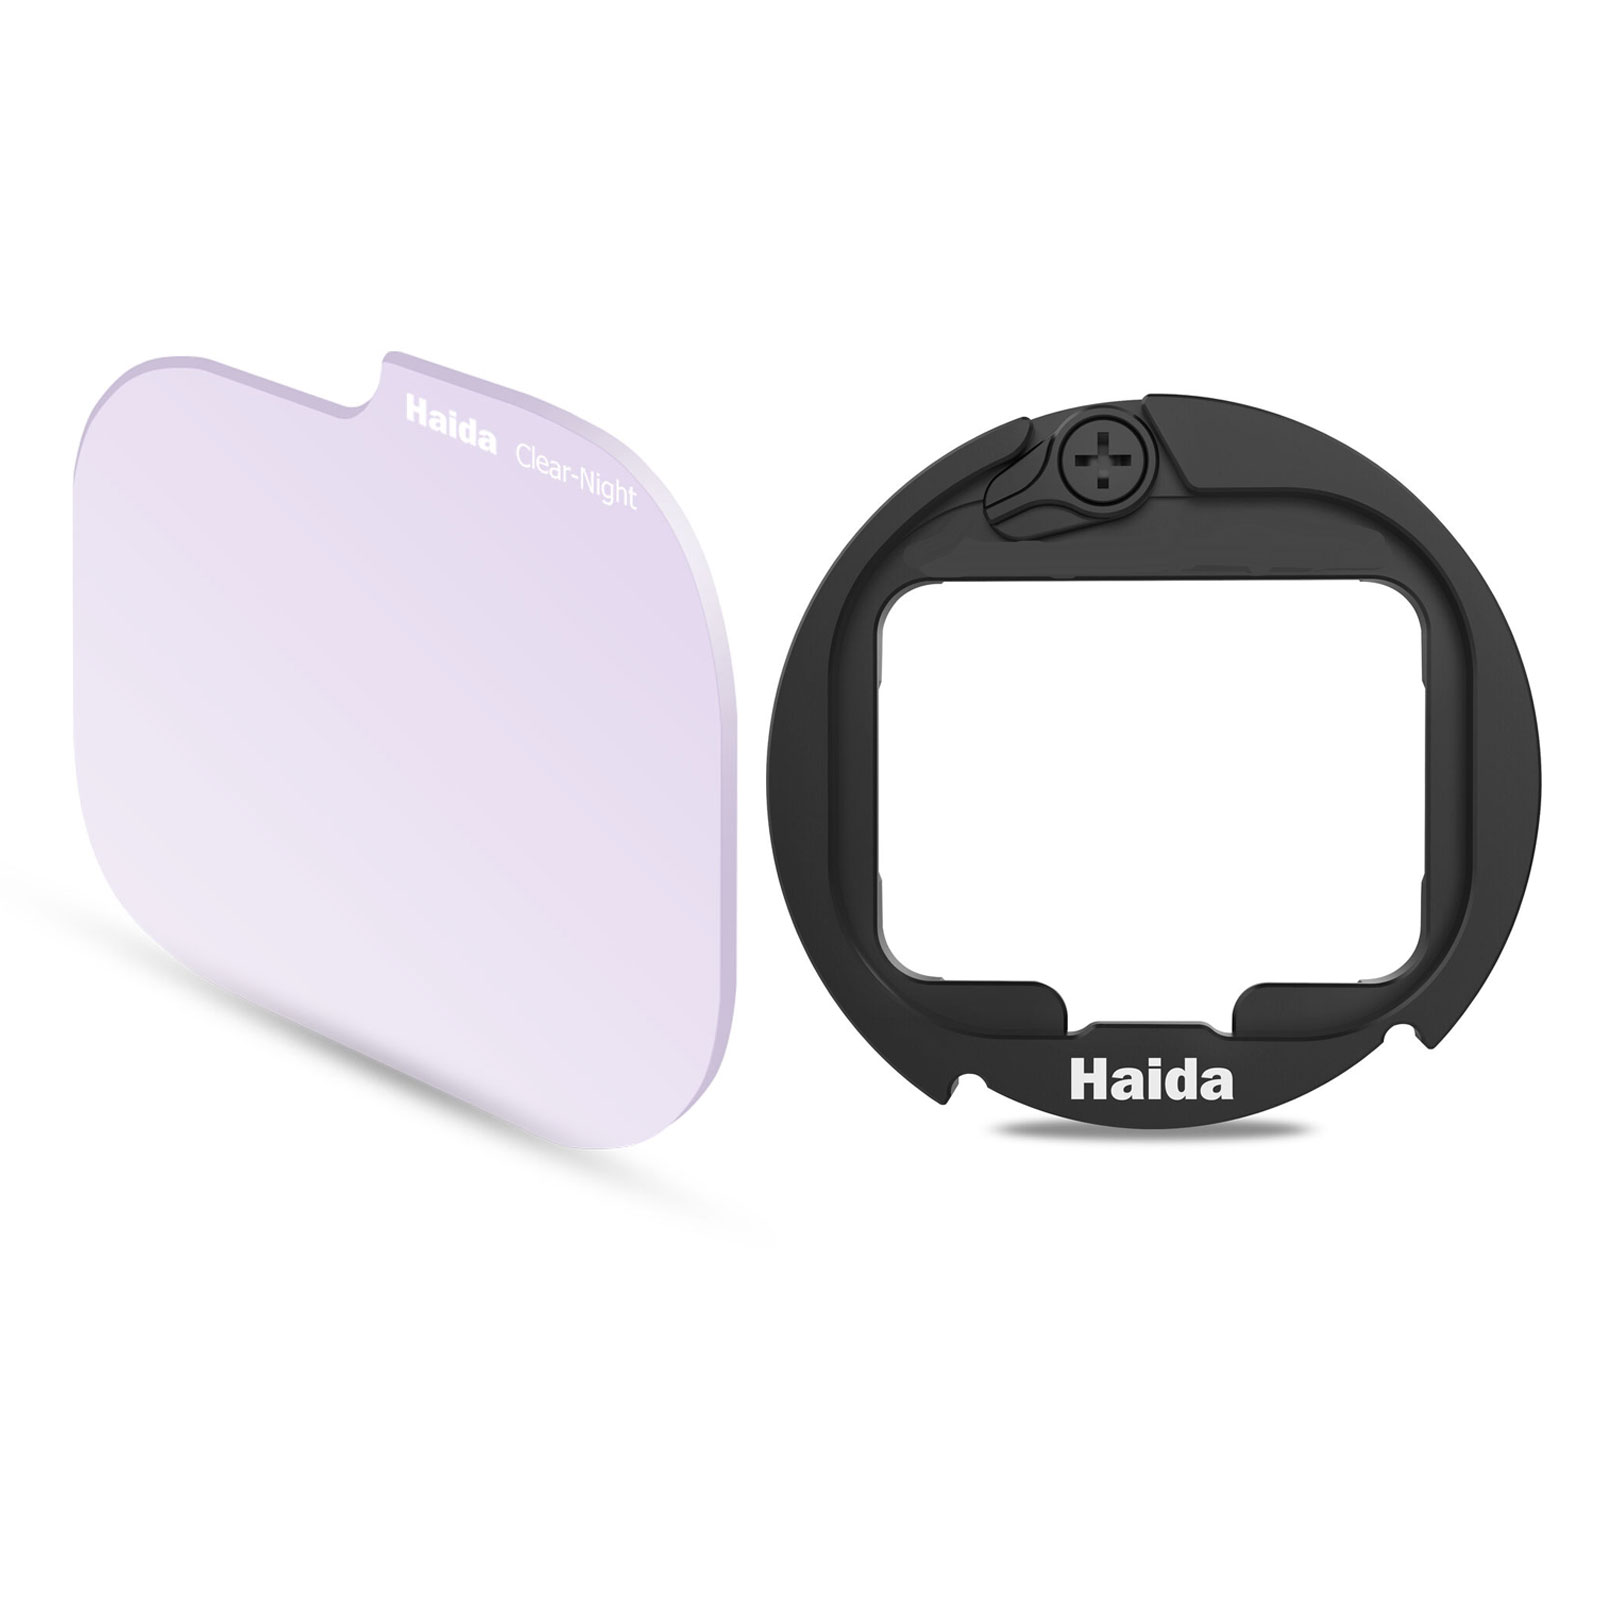 Haida-Rear-Lens-Clear-Night-Sony-Adapter-Ring